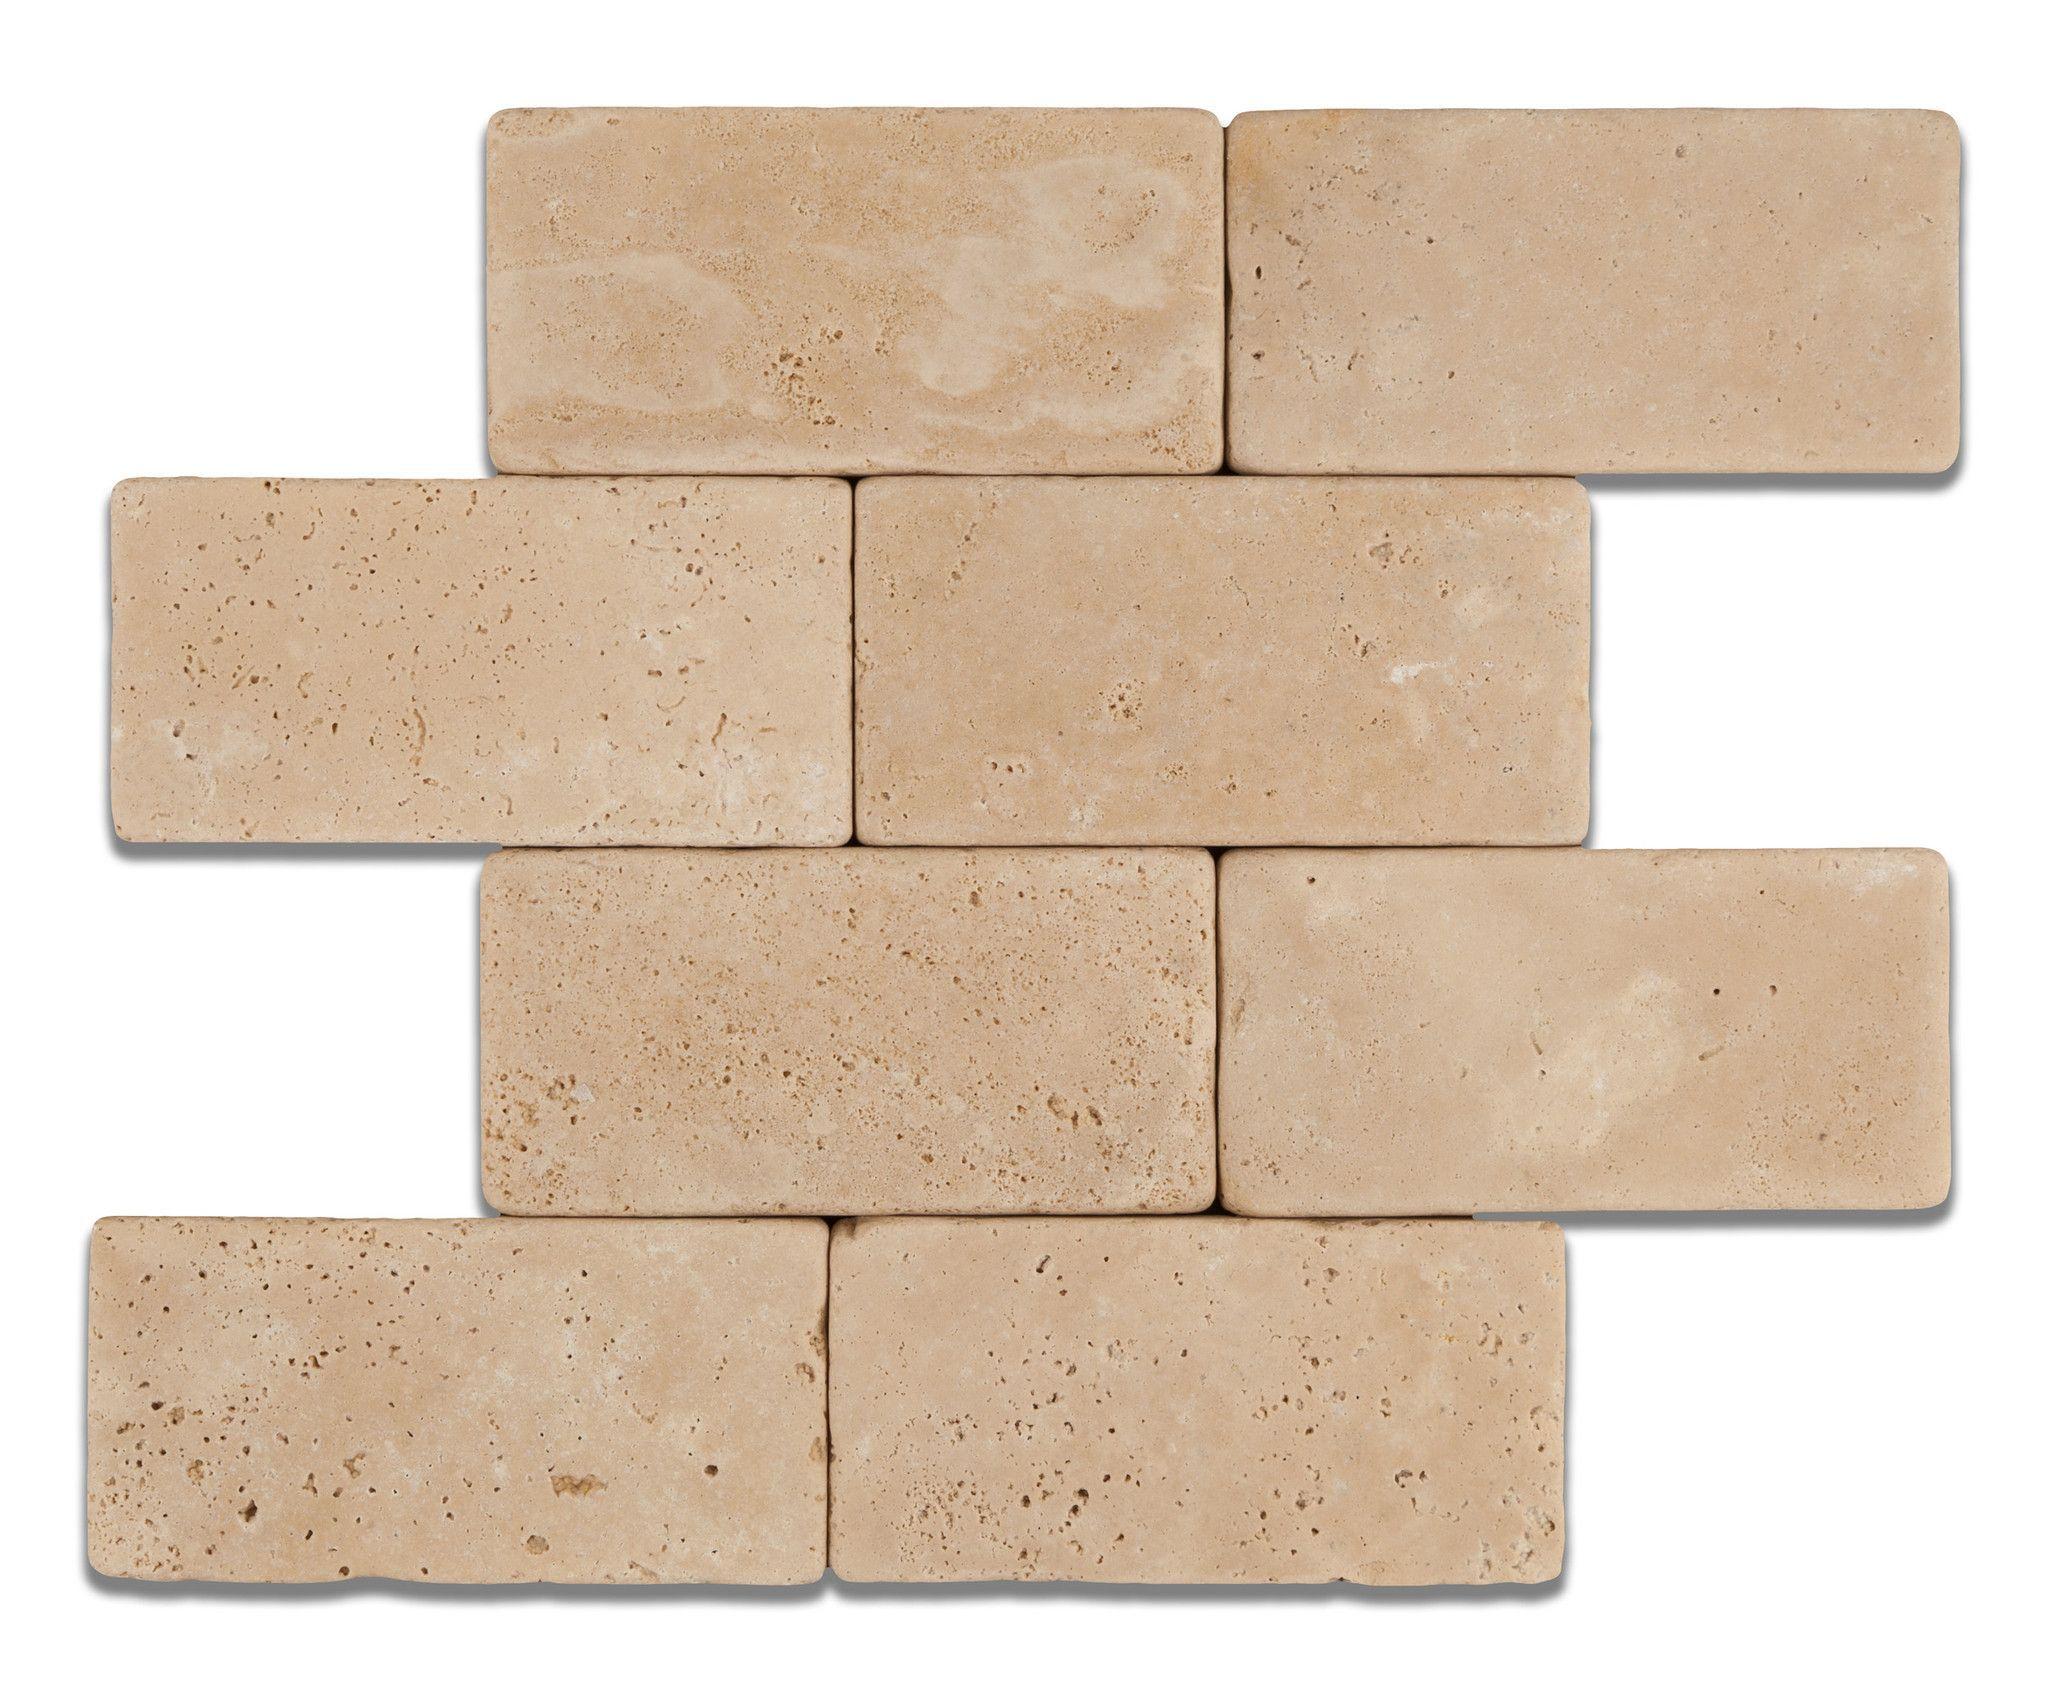 3 x 6 ivory travertine tumbled subway brick field tile 3 x 6 ivory travertine tumbled subway brick field tile doublecrazyfo Gallery